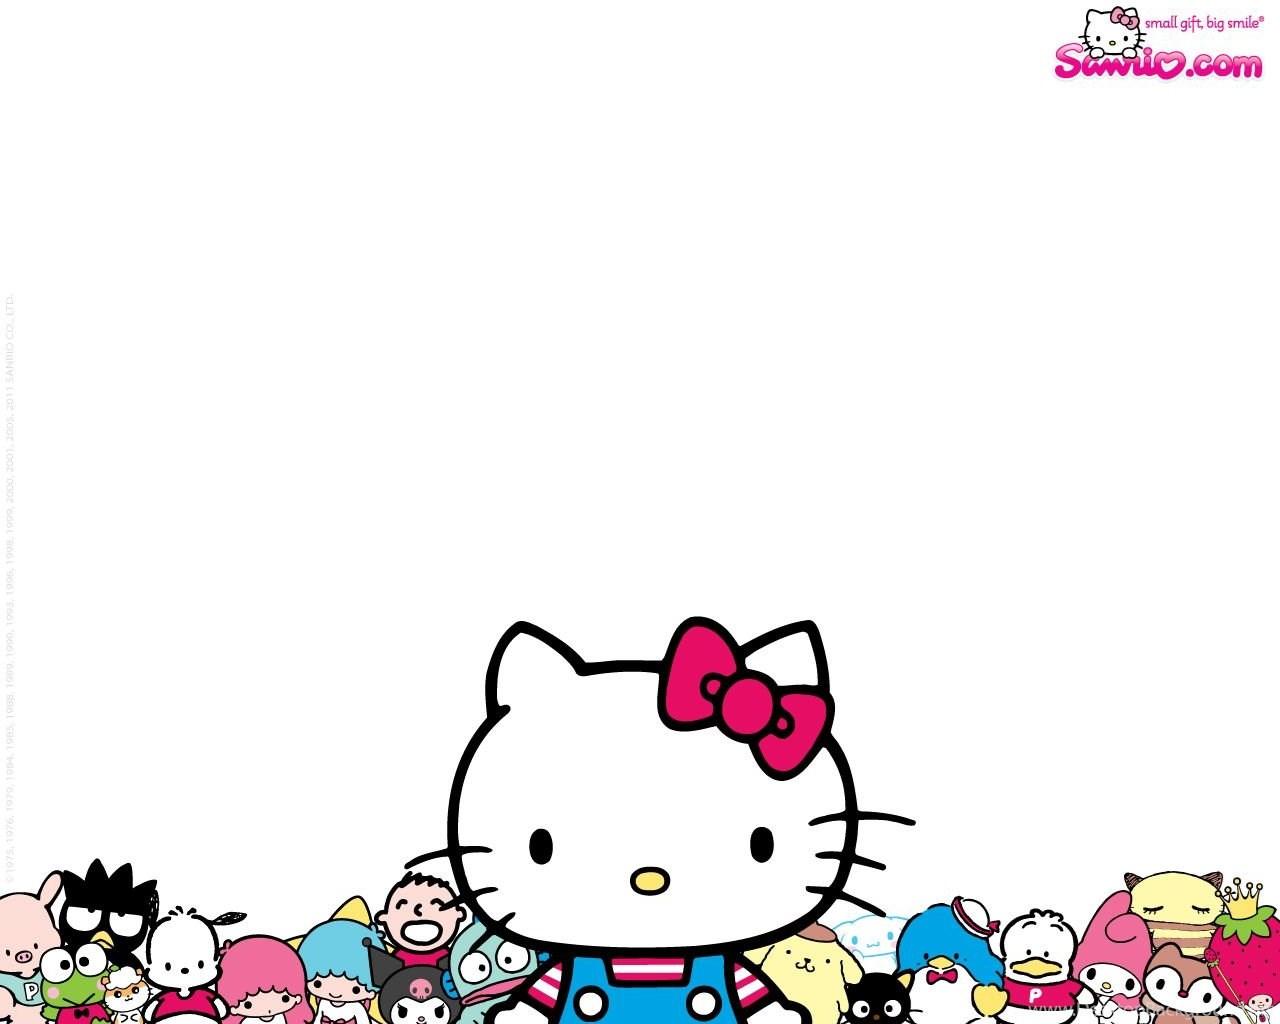 Best Wallpaper Hello Kitty Ipad 2 - 463190_90-hello-kitty-wallpaper-backgrounds_1280x1040_h  Collection_94153.jpg